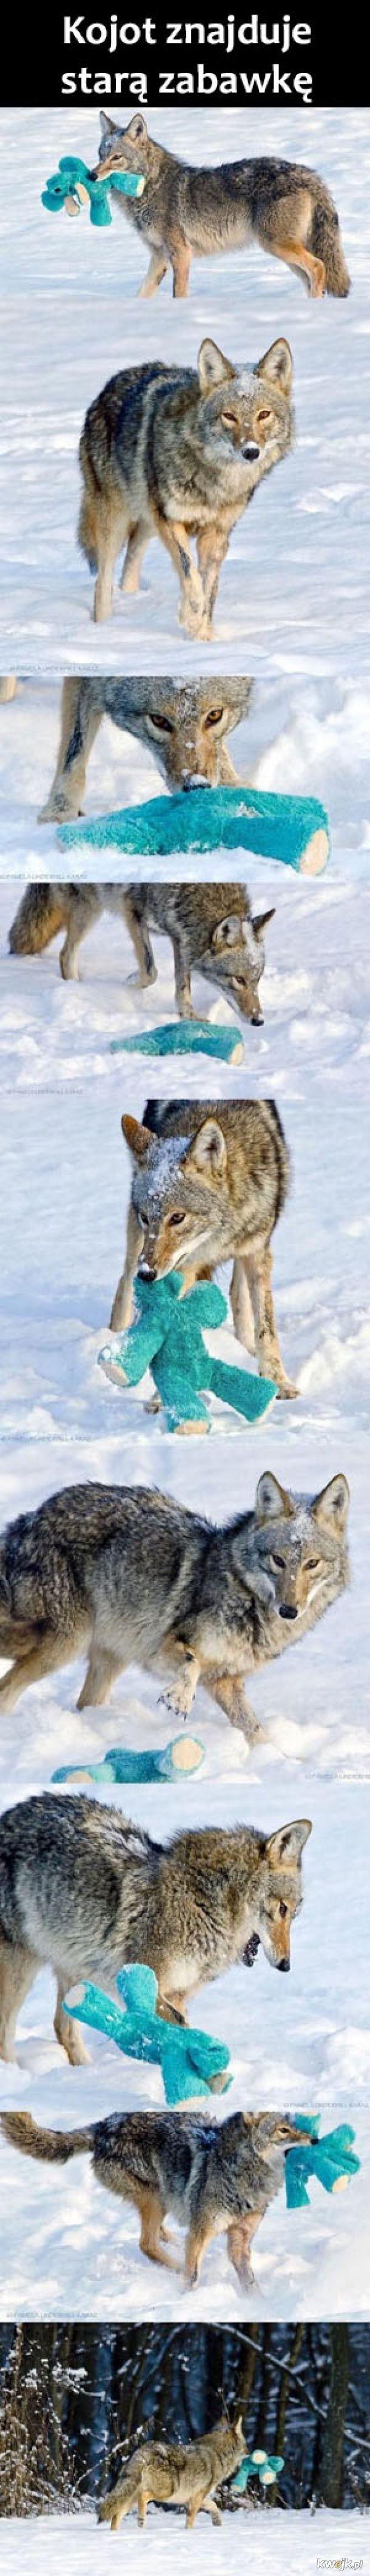 Słodki kojot